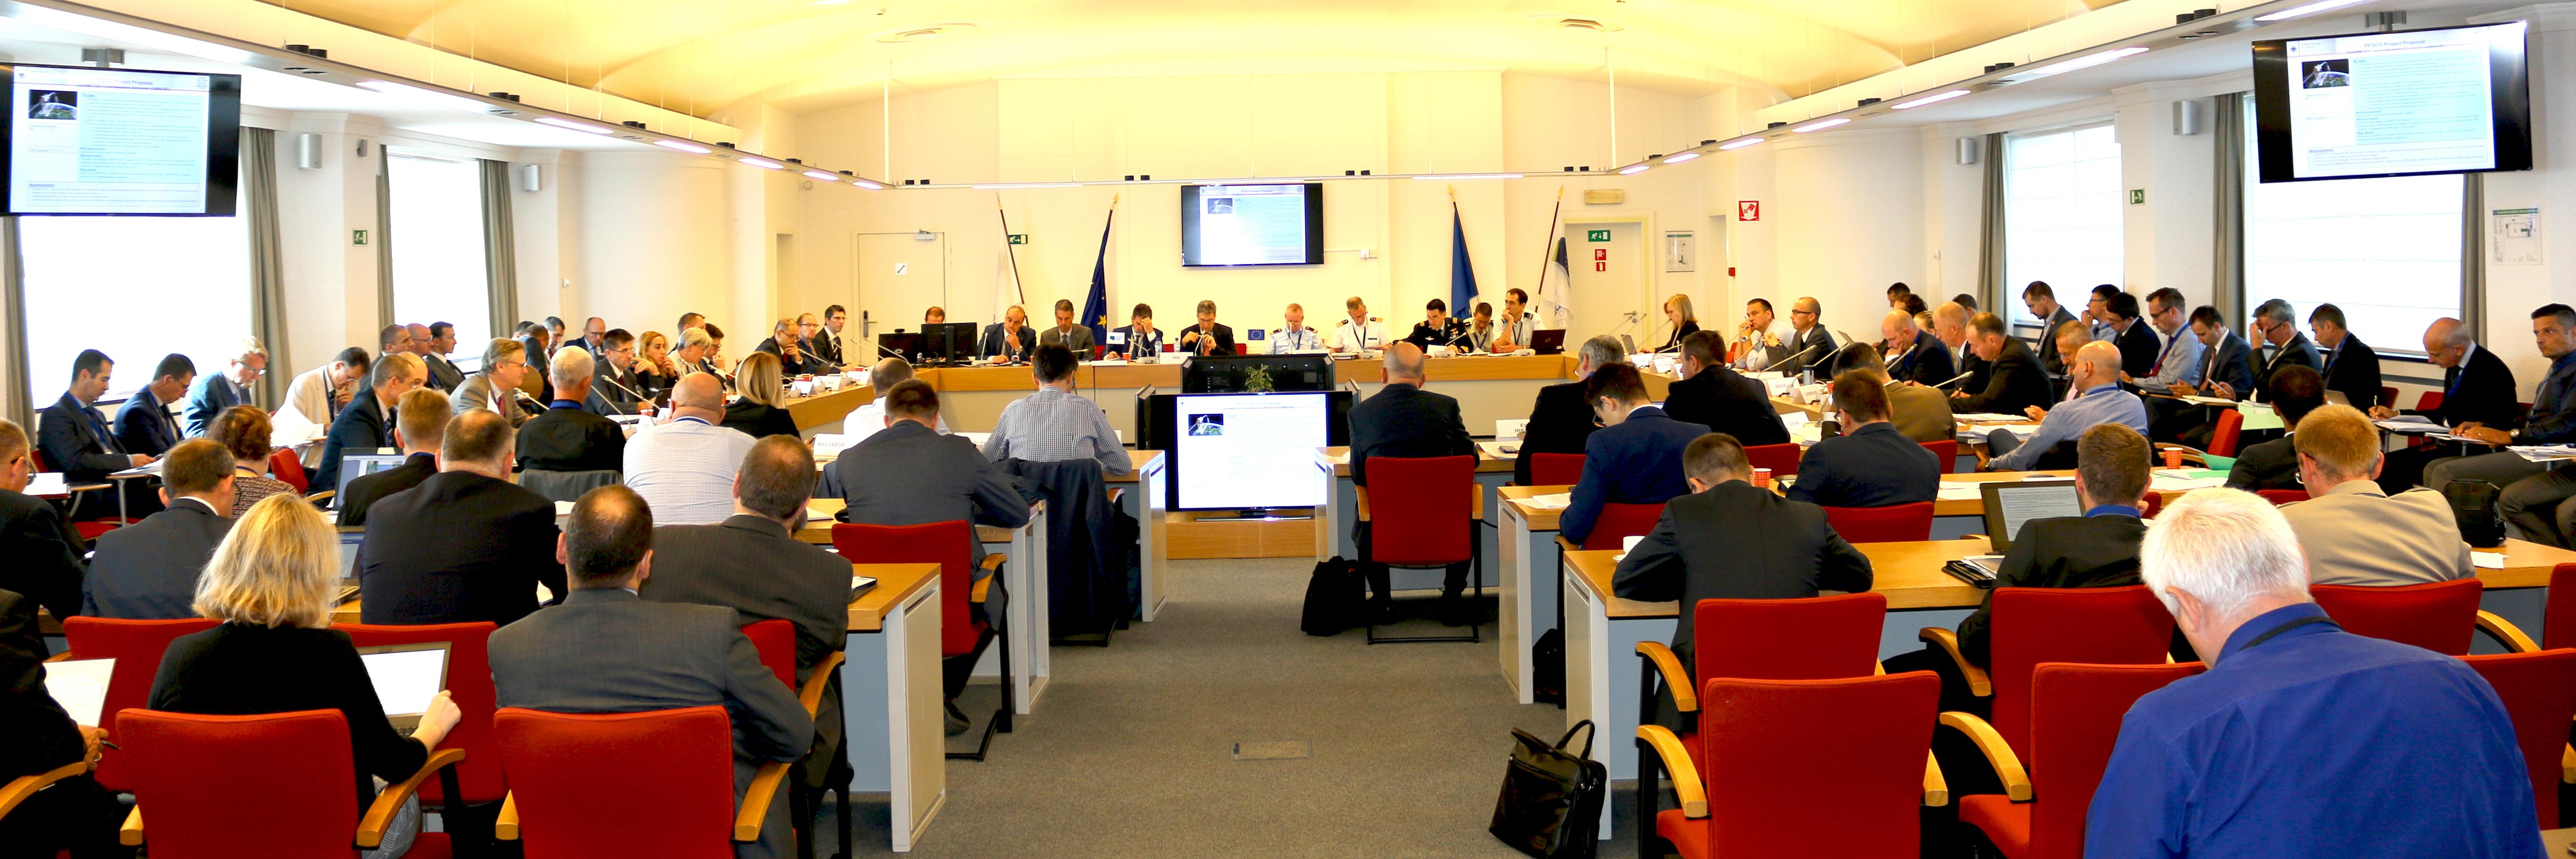 PESCO 'clarification workshop' held in EDA